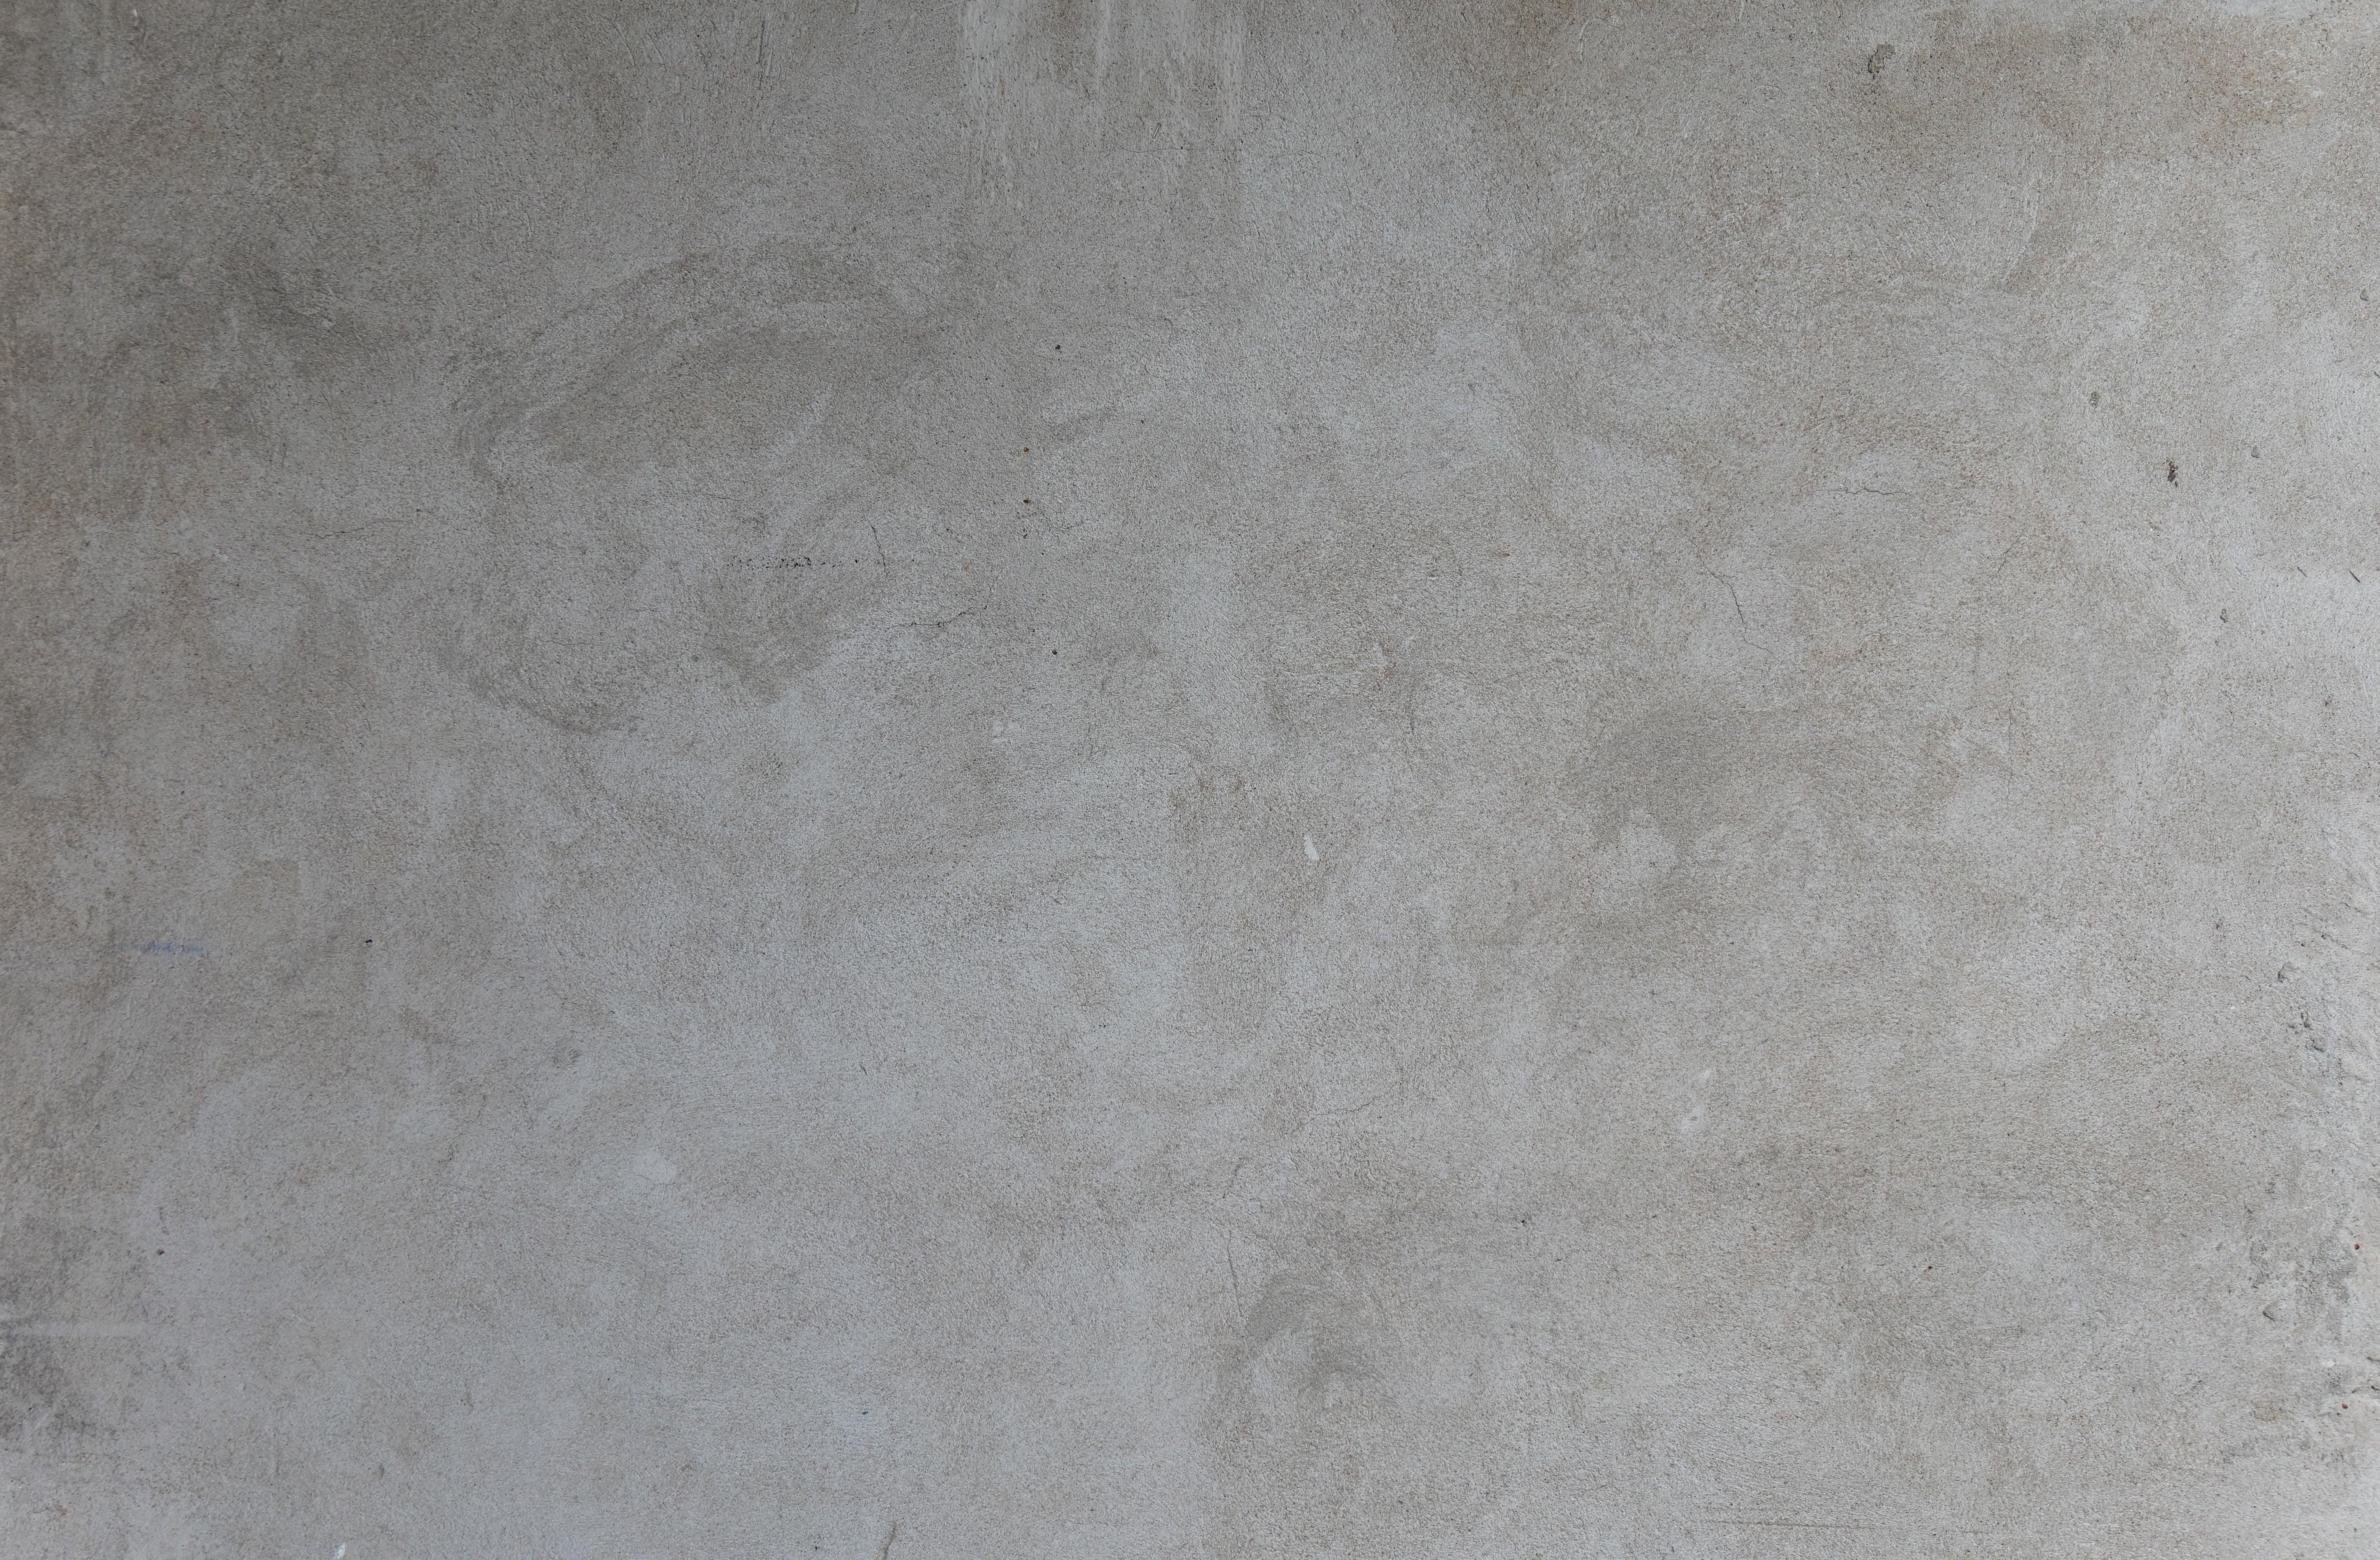 Light grey plain concrete wall - Concrete - Texturify - Free textures